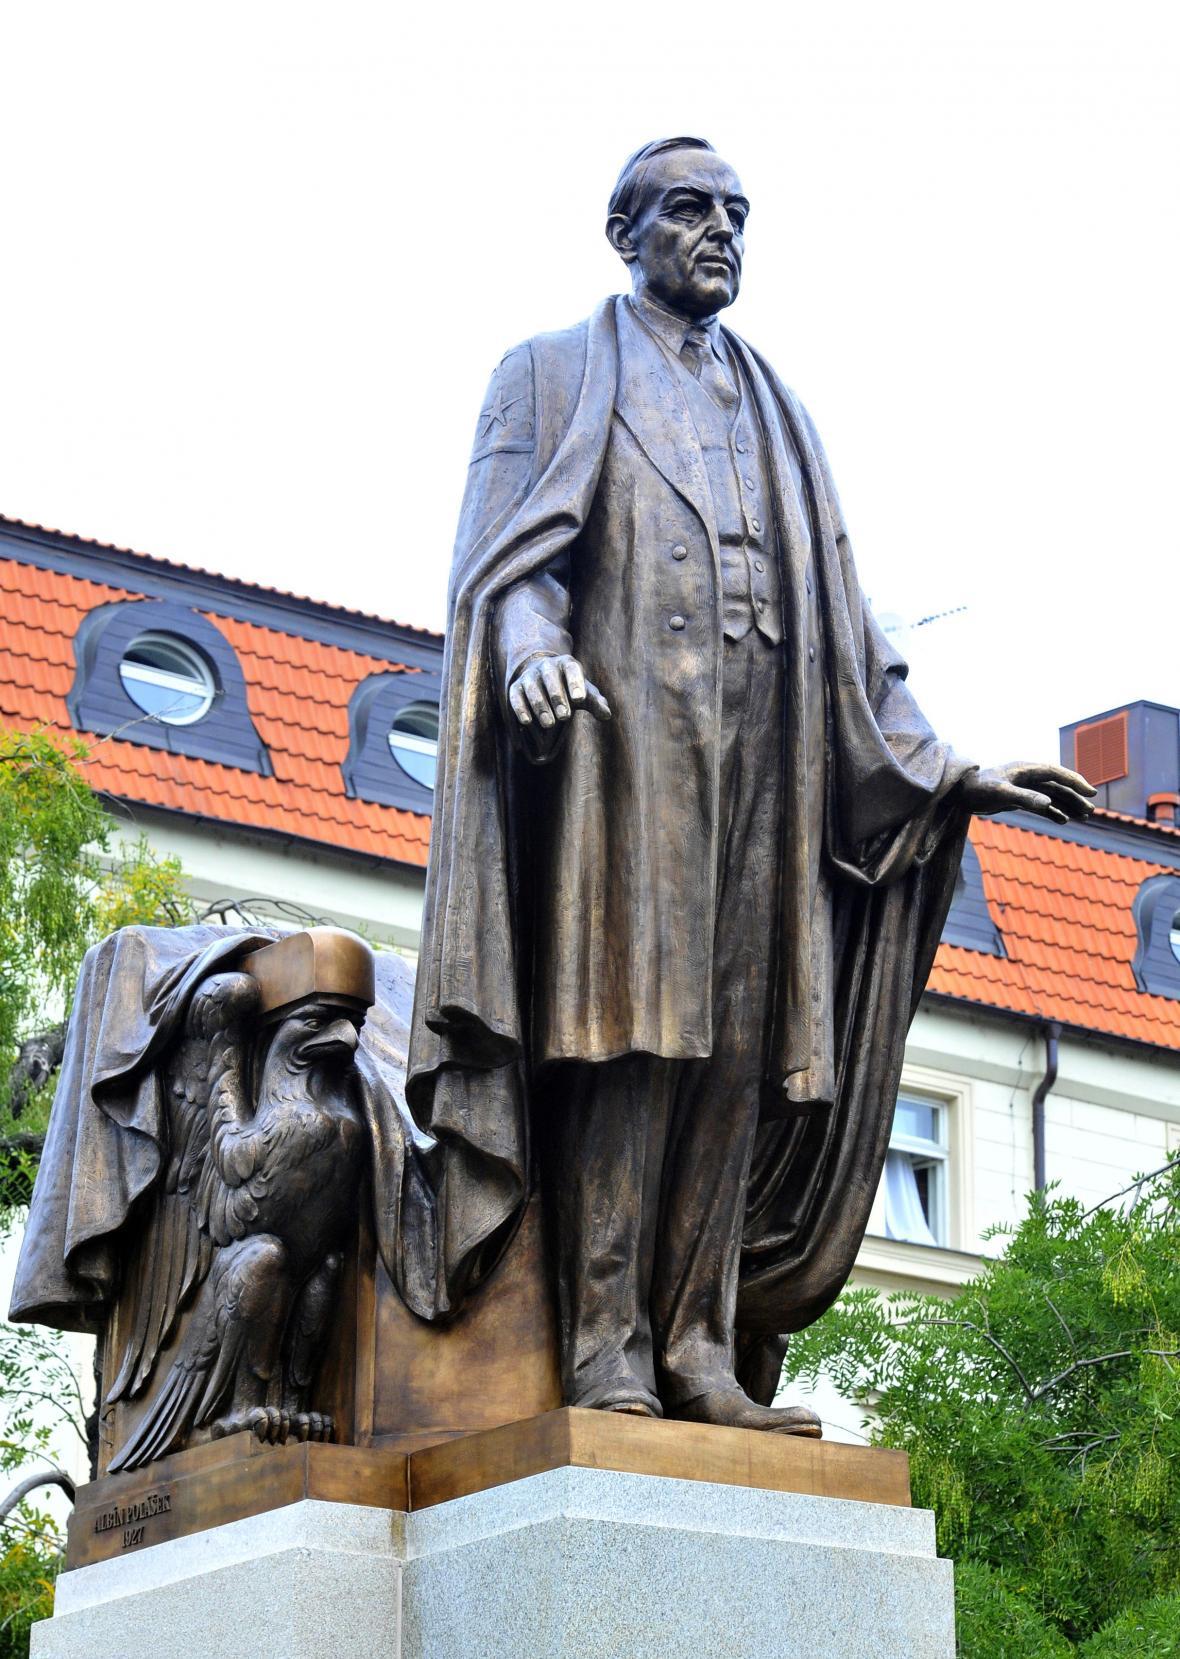 Pomník amerického prezidenta Woodrowa Wilsona ve Vrchlického sadech v Praze